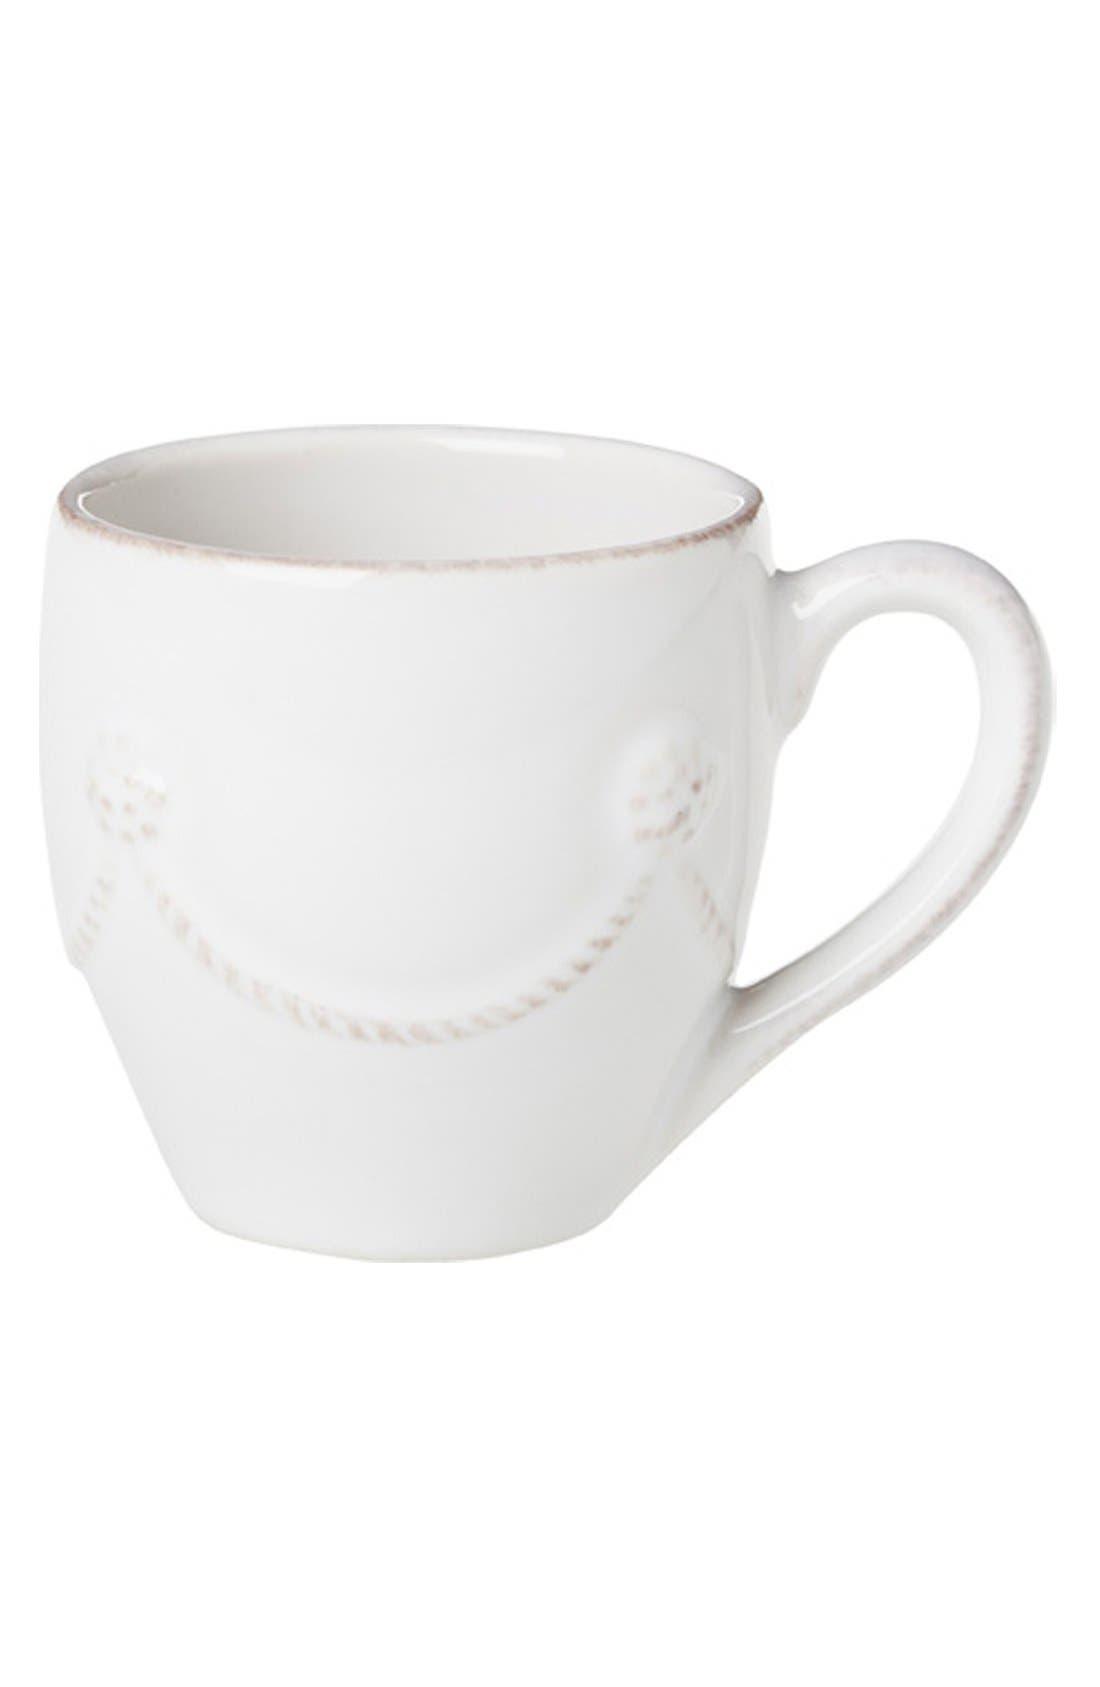 Main Image - Juliska 'Berry and Thread' Ceramic Demitasse Coffee Mug